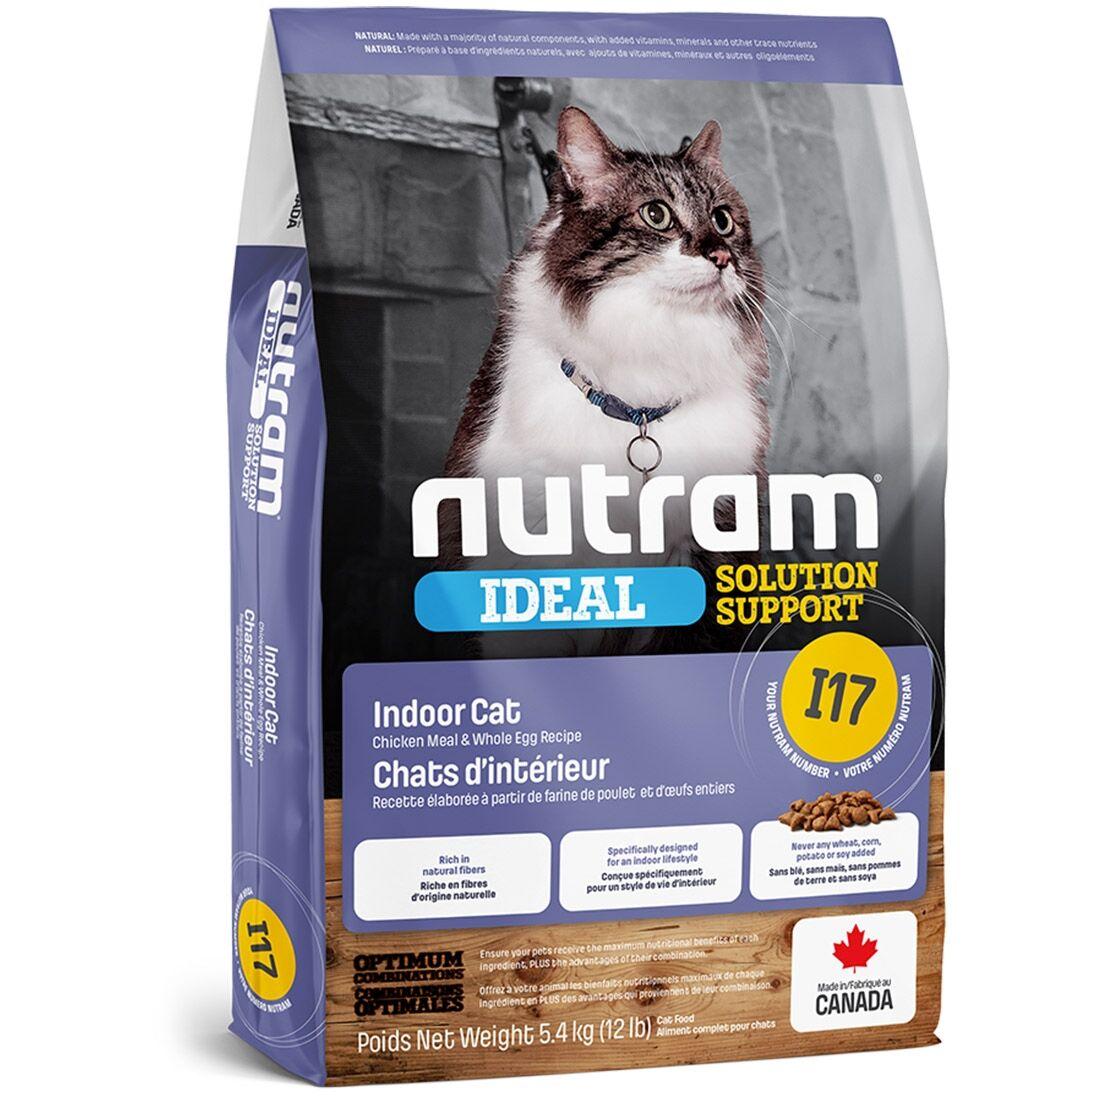 Nutram Croquettes chat Nutram Ideal Solution Support I17 Indoor Shedding Cat Contenance : 5,4 kg